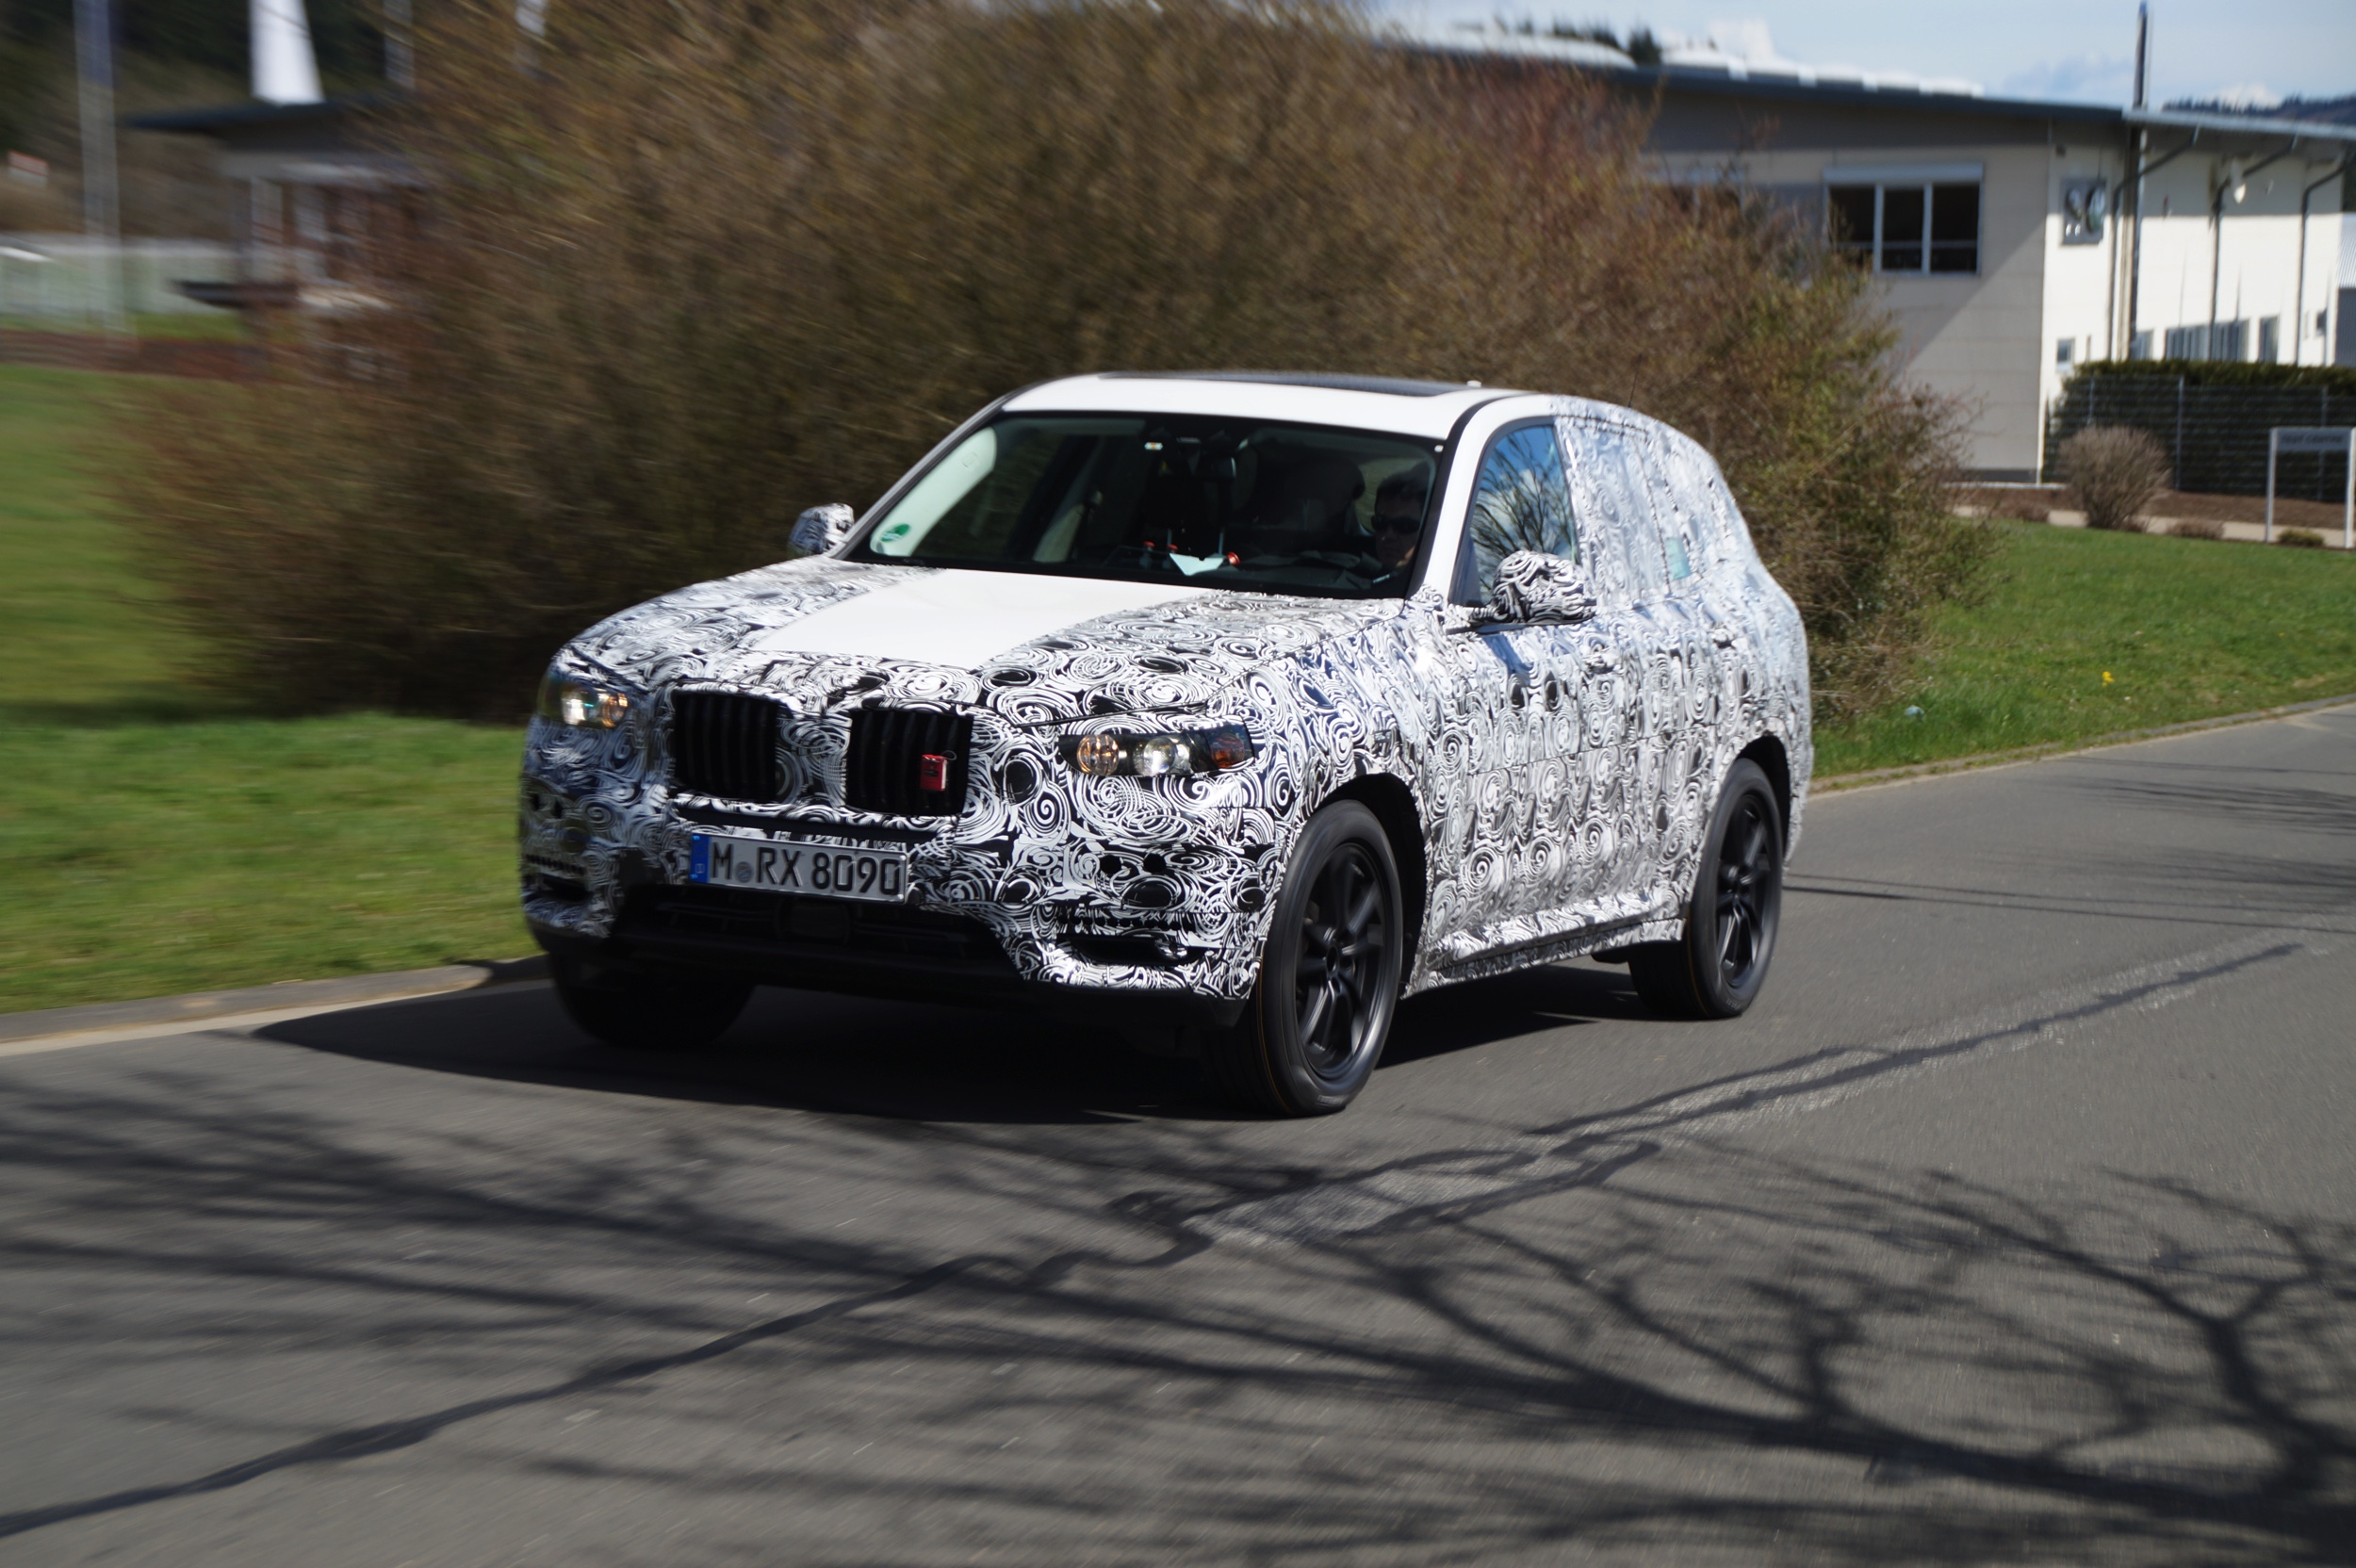 BMW X3 - Wilco Blok - Autovisie.nl - 1